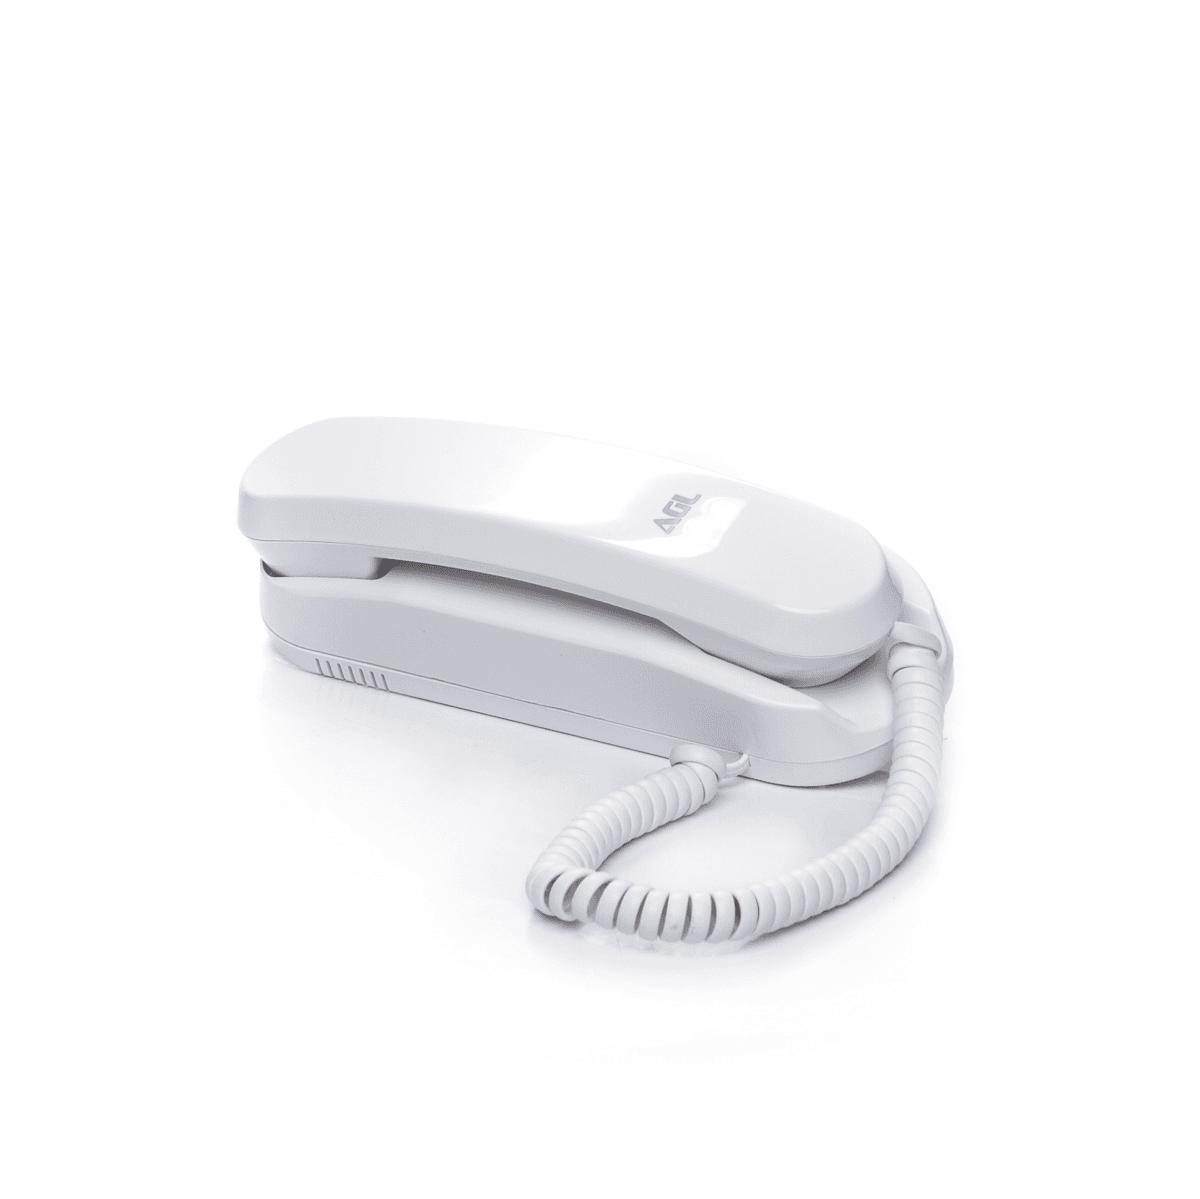 Kit Interfone AGL P100 ou P200 + Fechadura Elétrica e Cabo